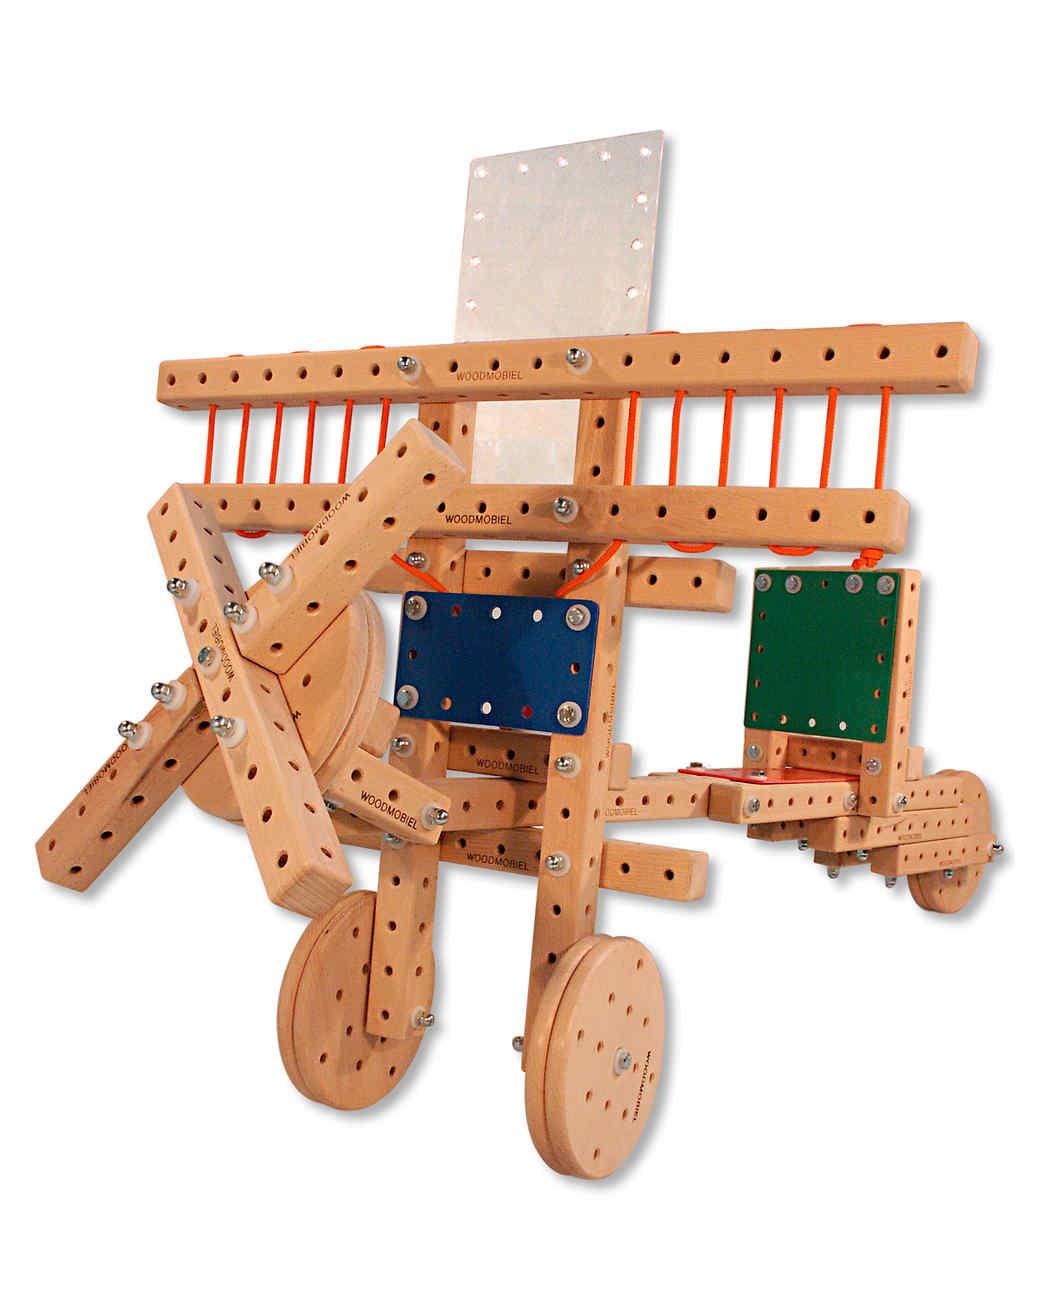 woodmobiel-building-set.jpg